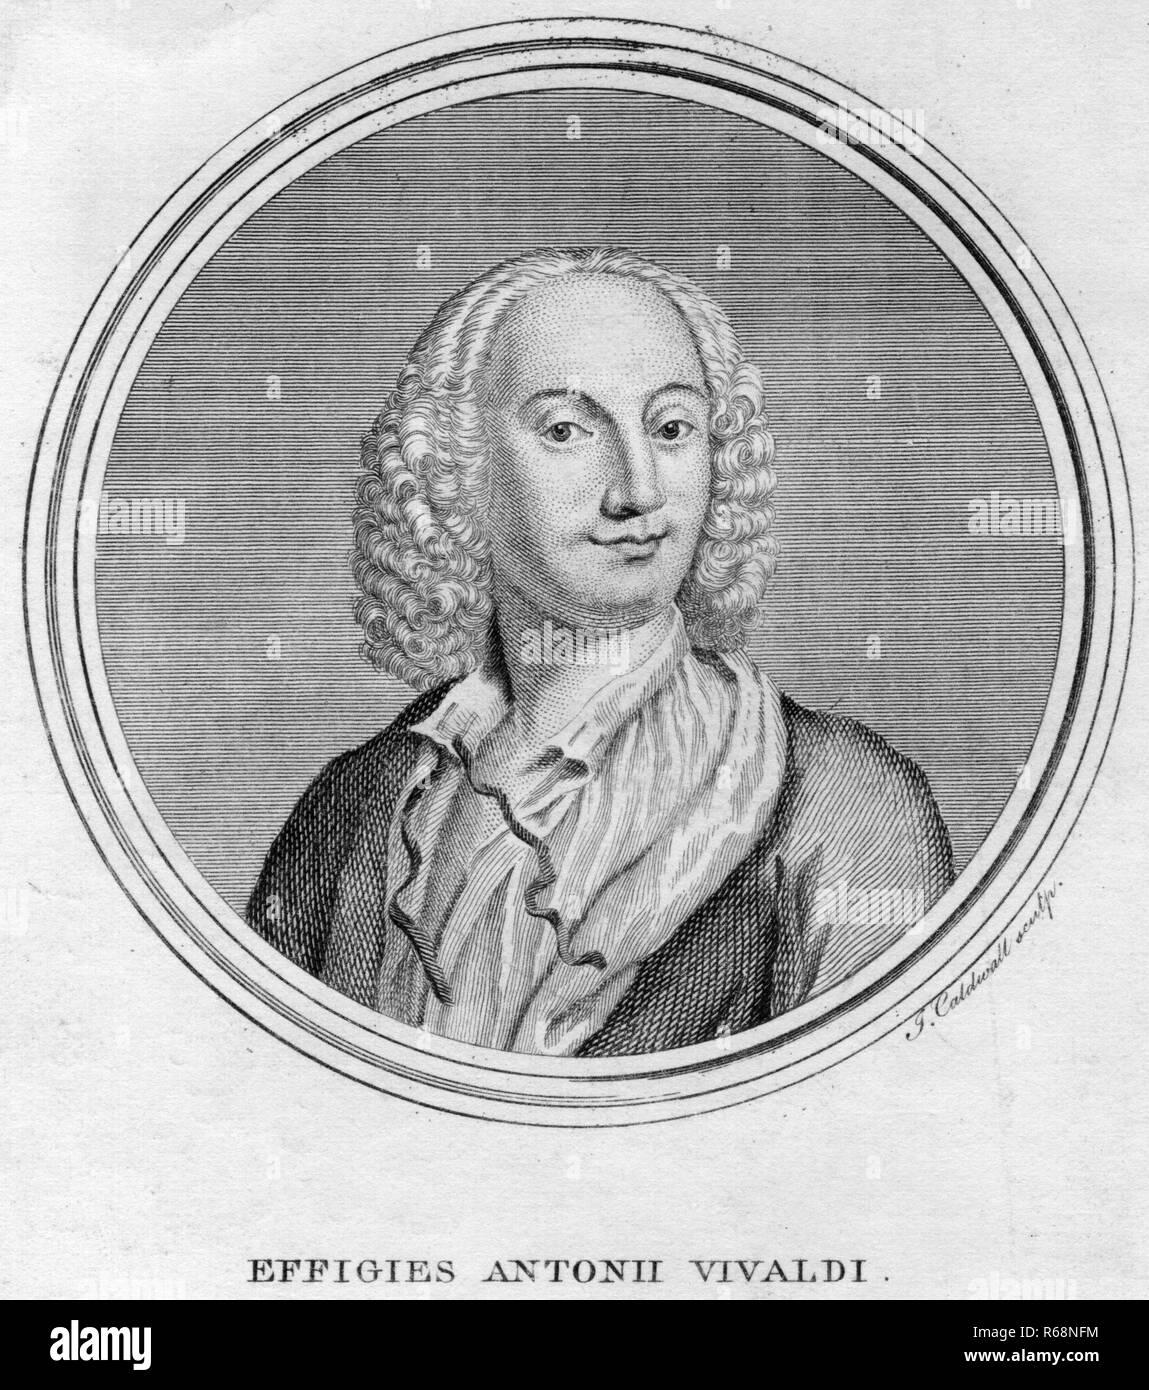 Italian violinist and composer Antonio Vivaldi (1678 - 1741), circa 1725.   (Photo by Hulton Archive/Getty Images) - Stock Image